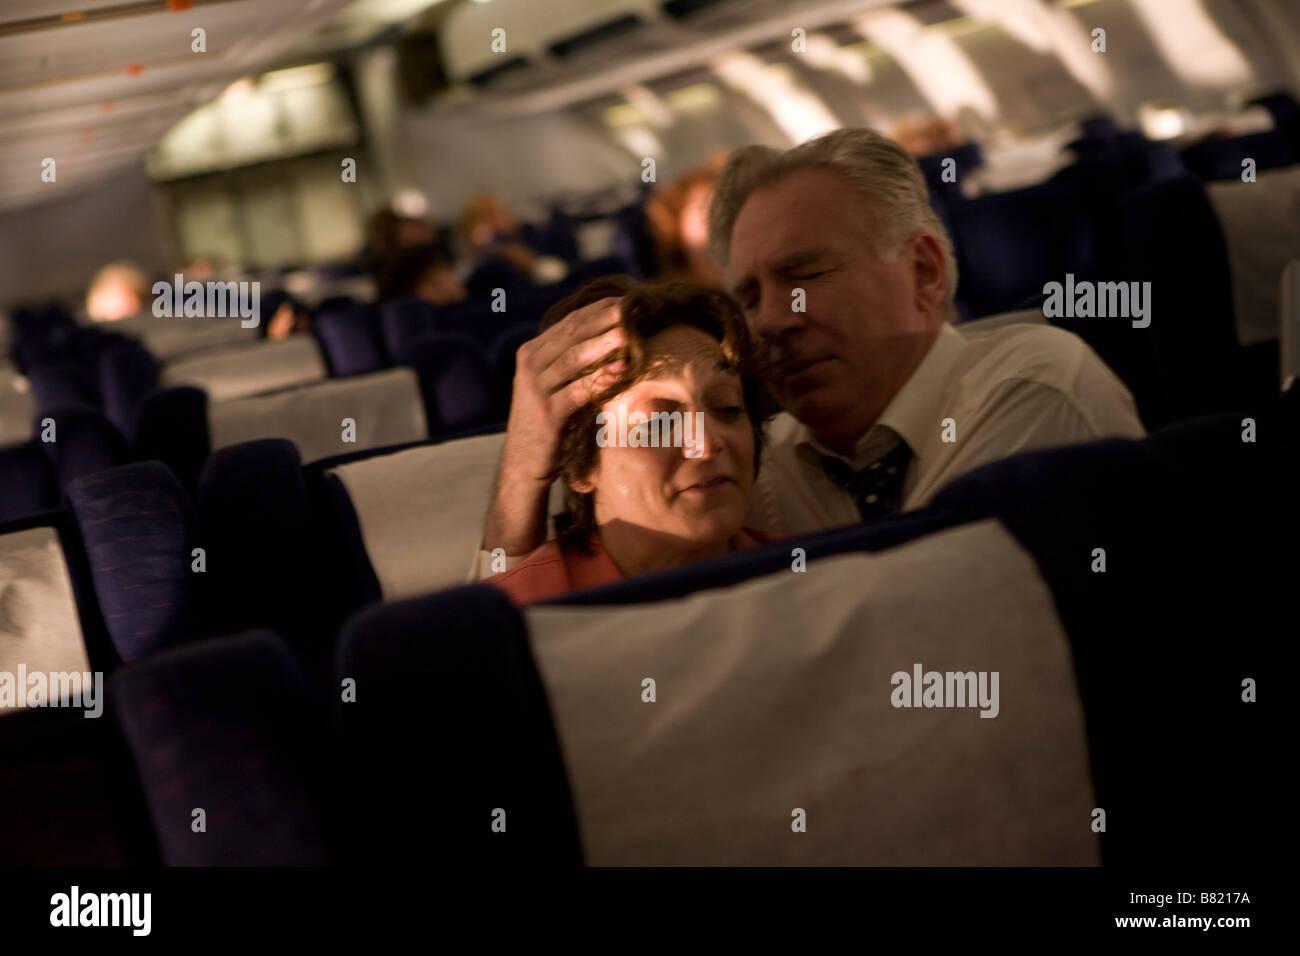 United 93 Año 2006 USA Becky London, Tom O'Rourke Director: Paul Greengrass Foto de stock